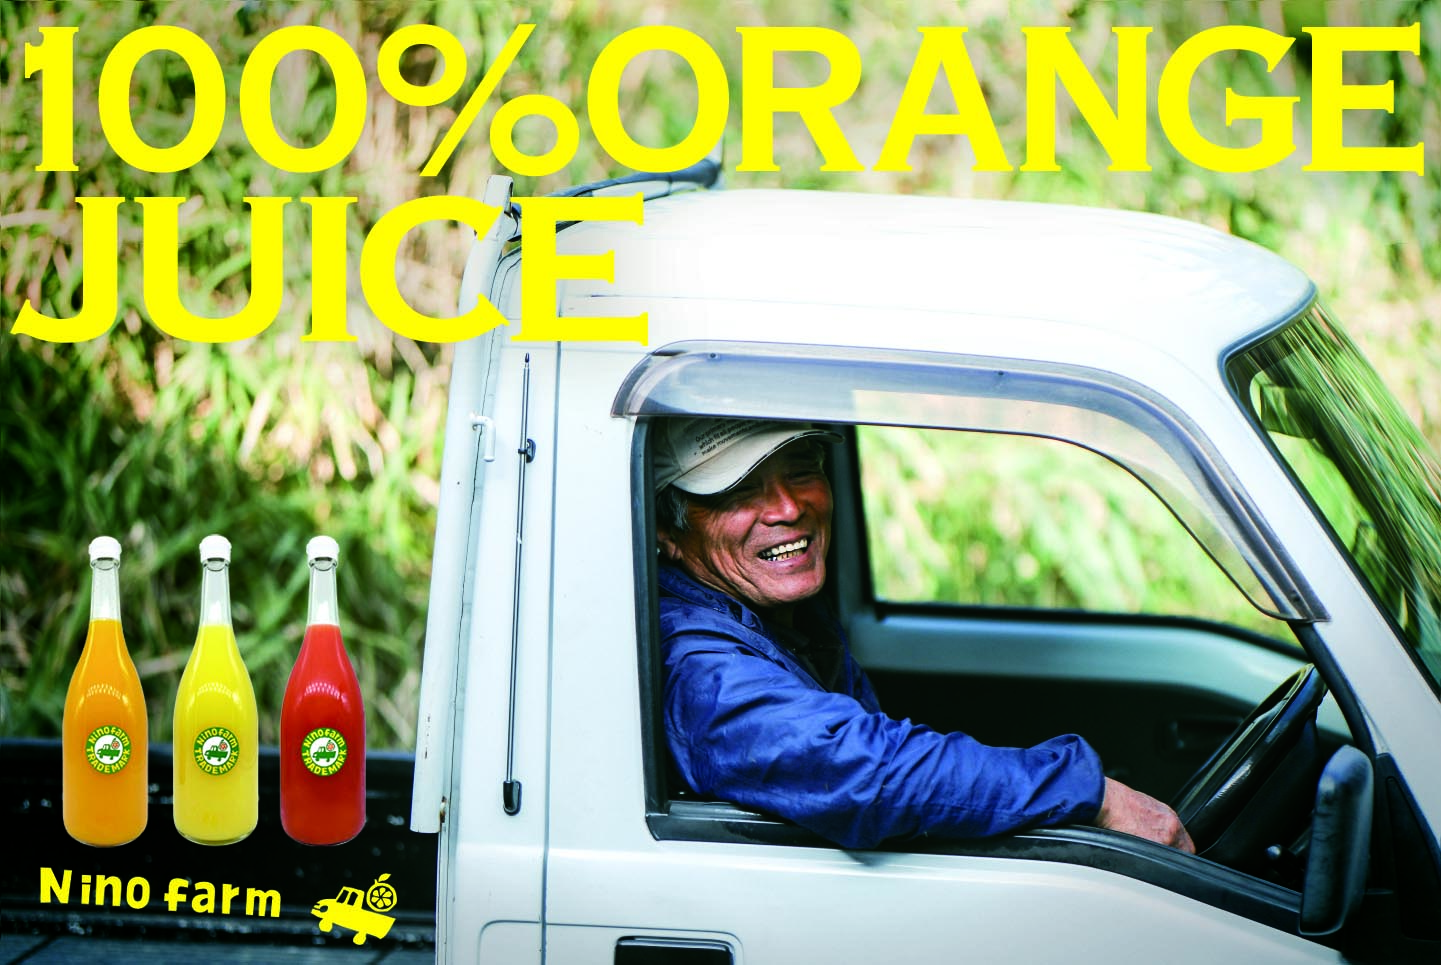 Nino farmのジュース